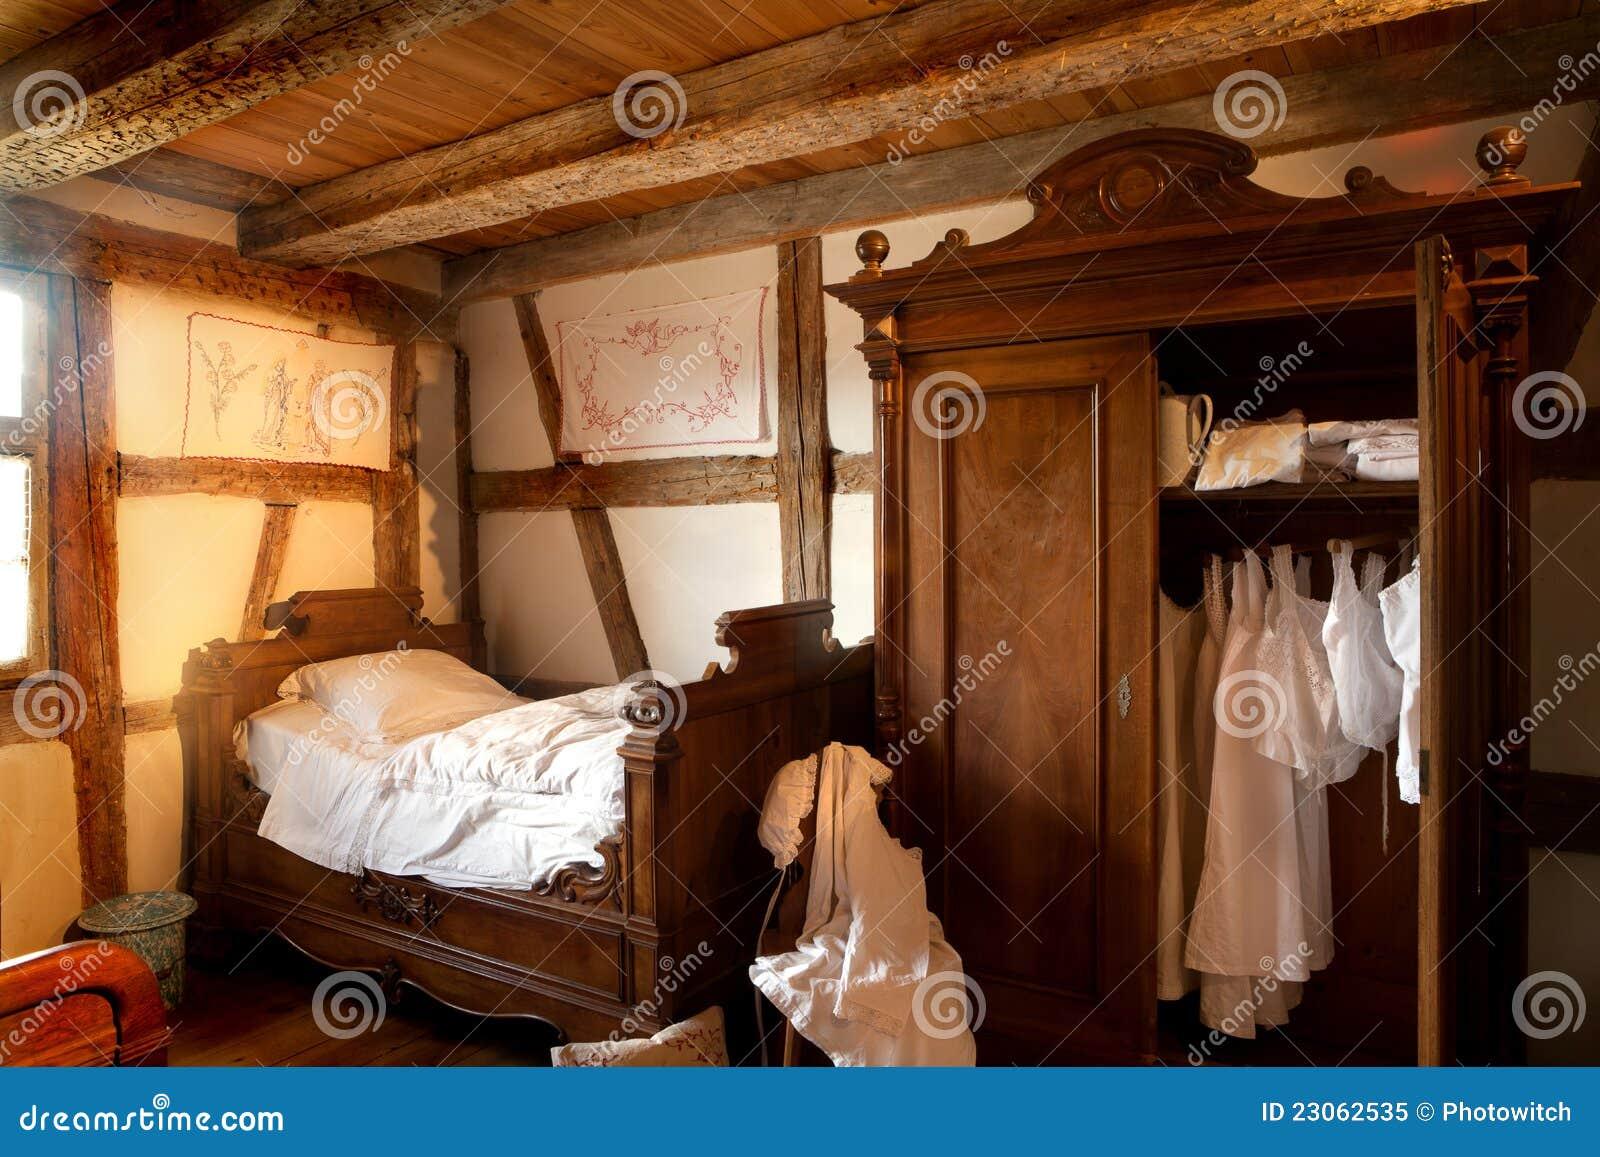 Dormitorio del siglo xix foto de archivo libre de regal as for Diseno de interiores siglo xix